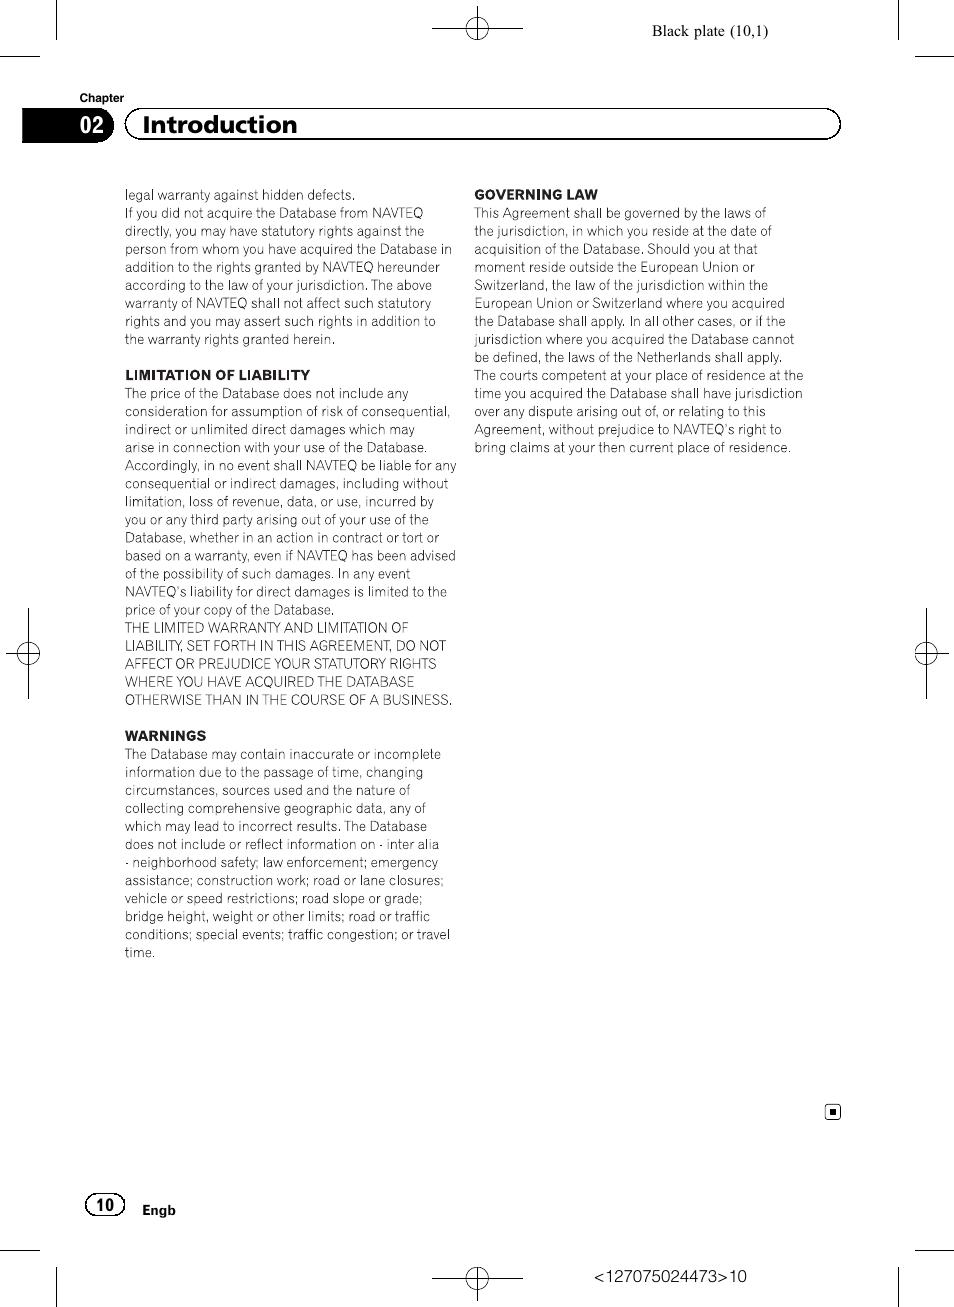 02 introduction pioneer avic f250 user manual page 10 76 rh manualsdir com NAVTEQ Update NAVTEQ Maps